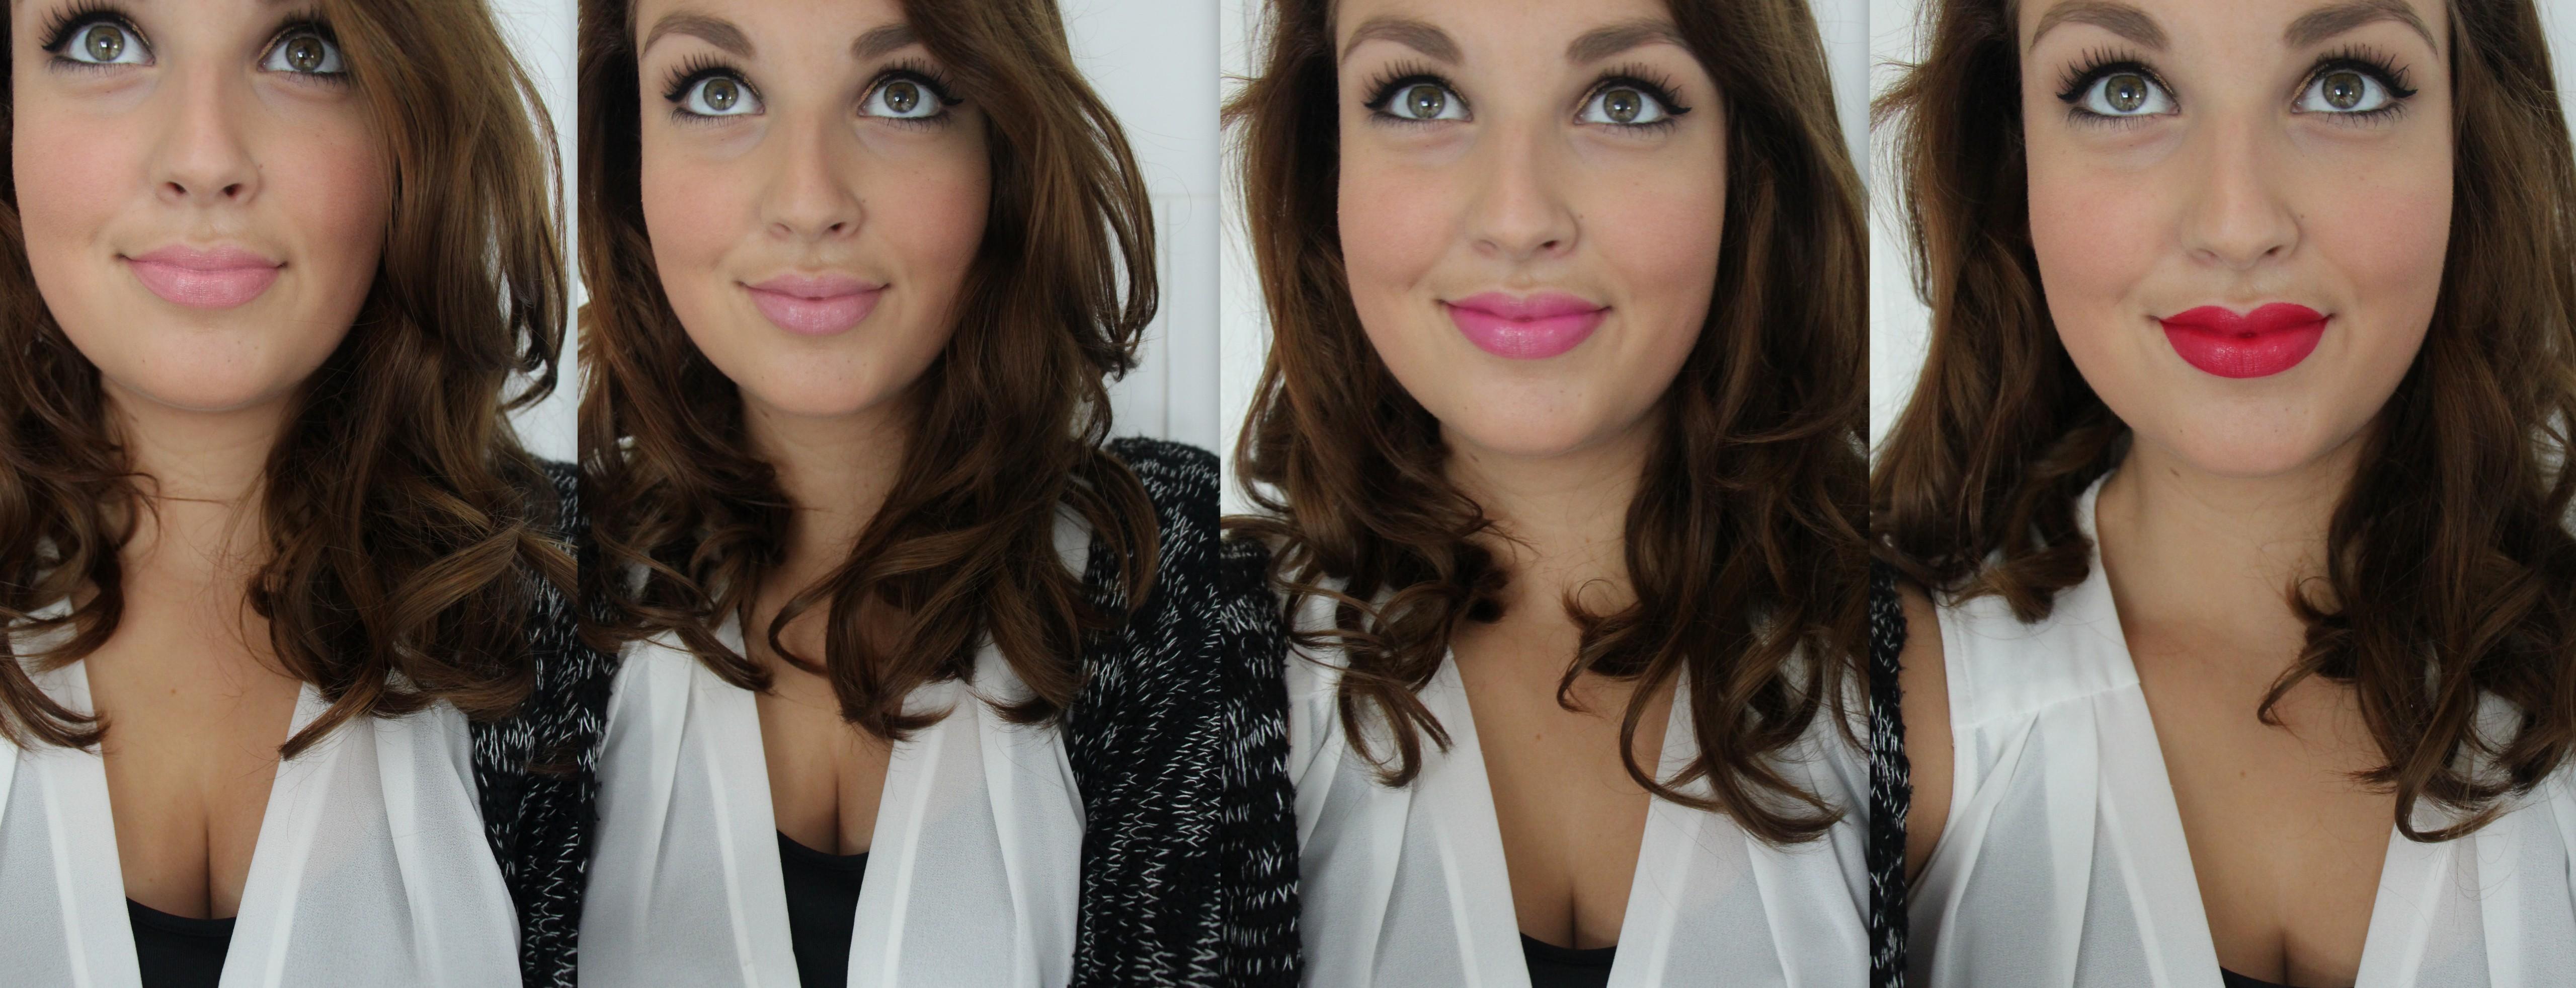 Gosh lipsticks1-001